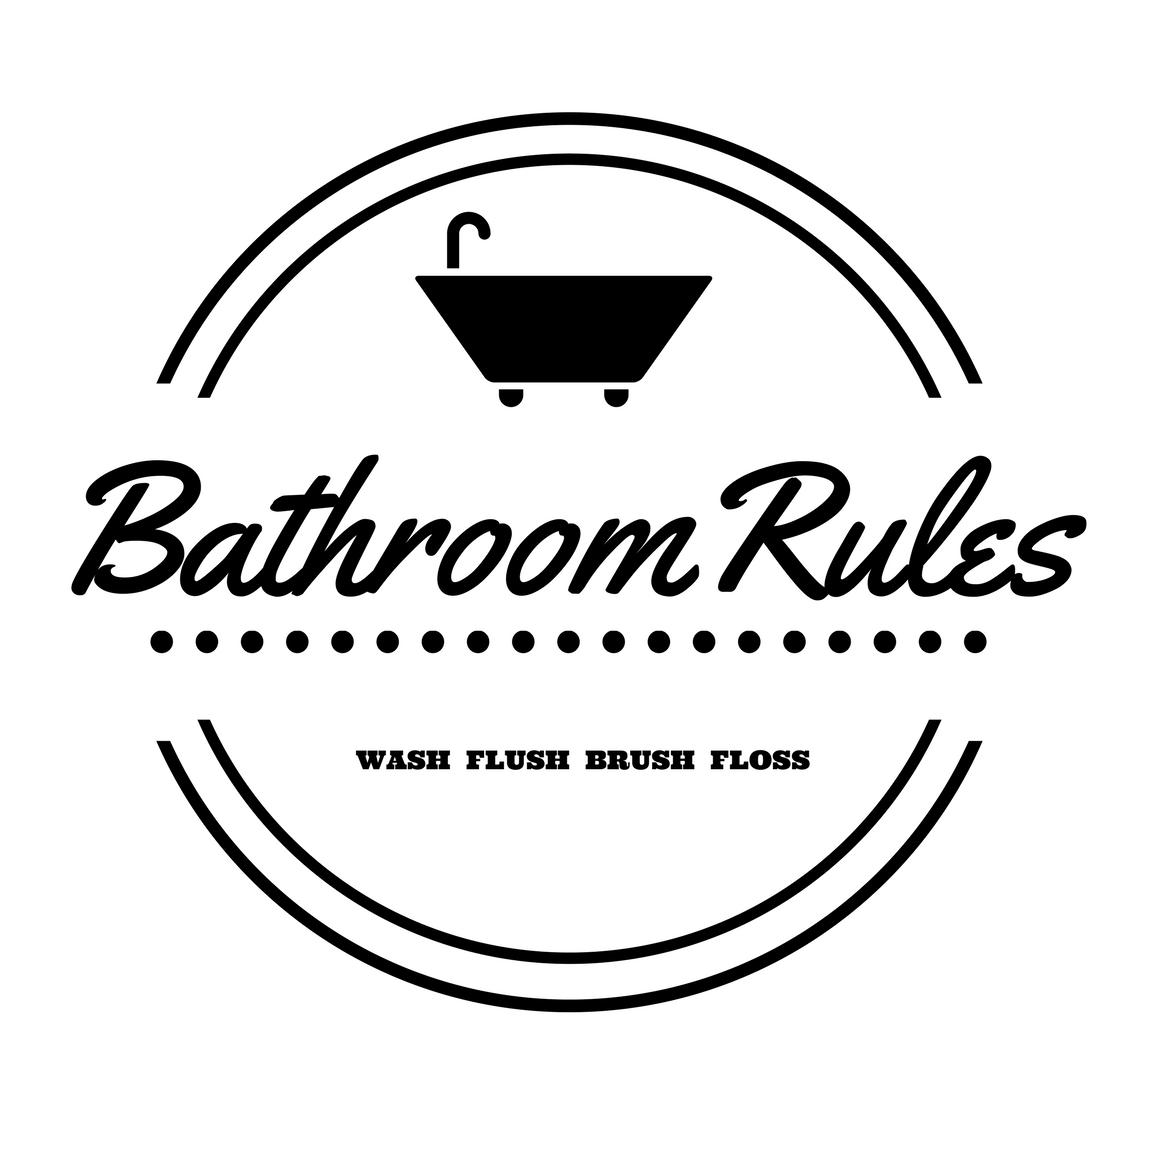 Bathroom Rules Printable